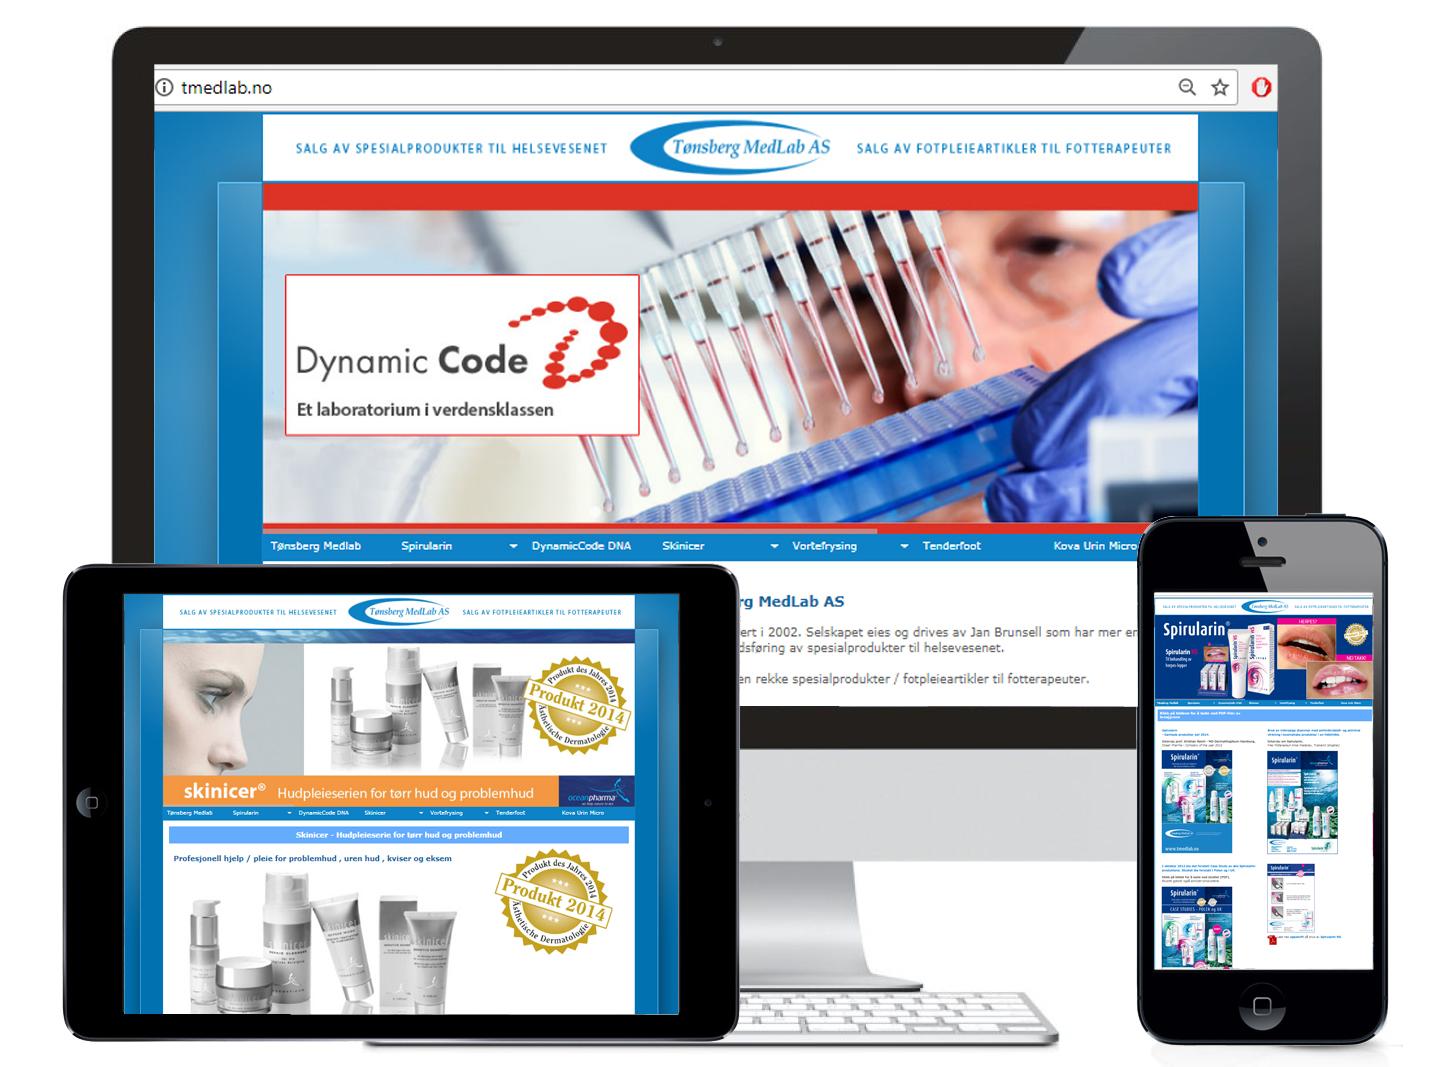 Desktop_tablet_mobile_web01.jpg